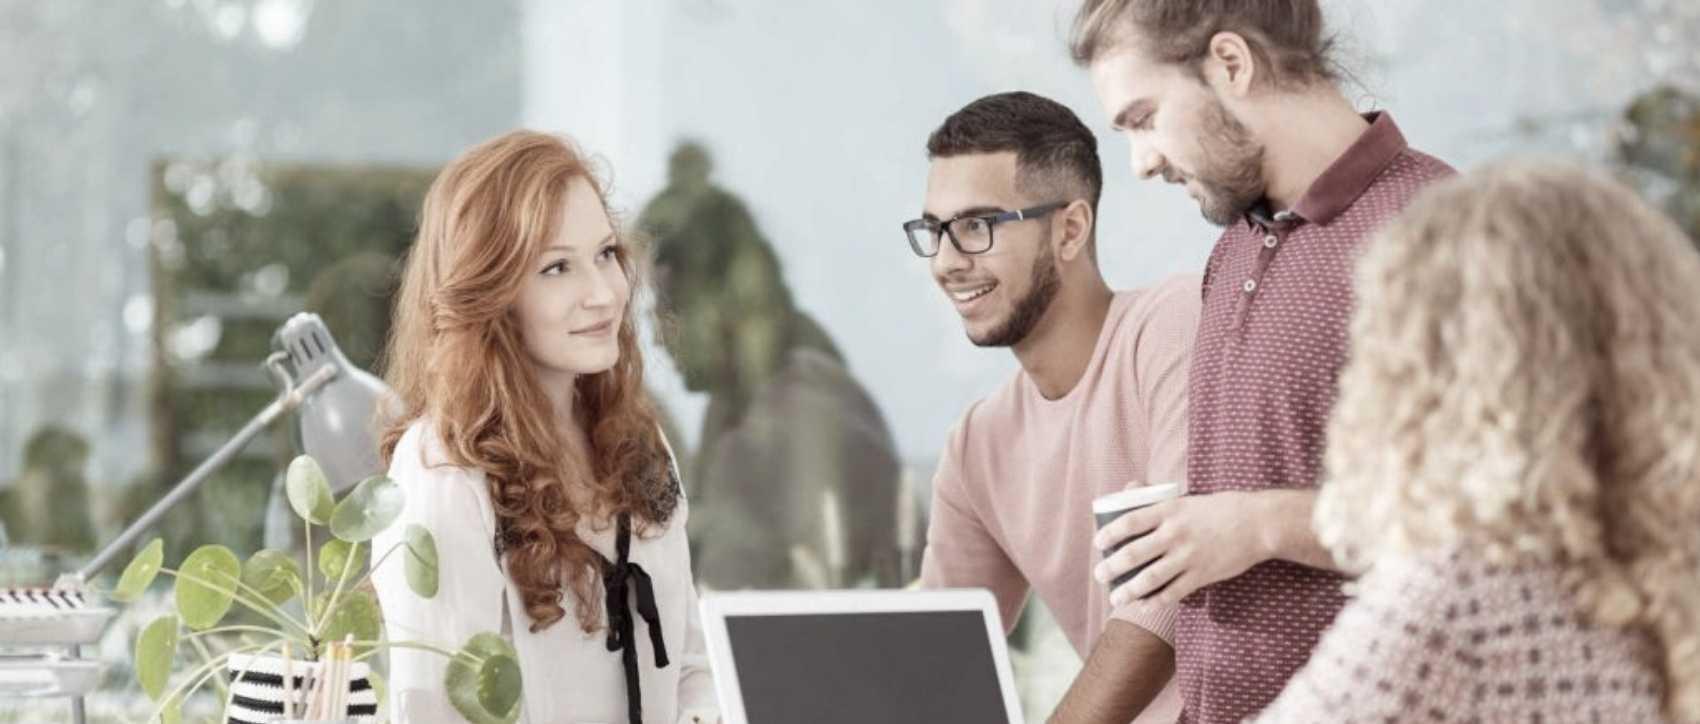 Choisir ses tarifs en tant qu'agence marketing